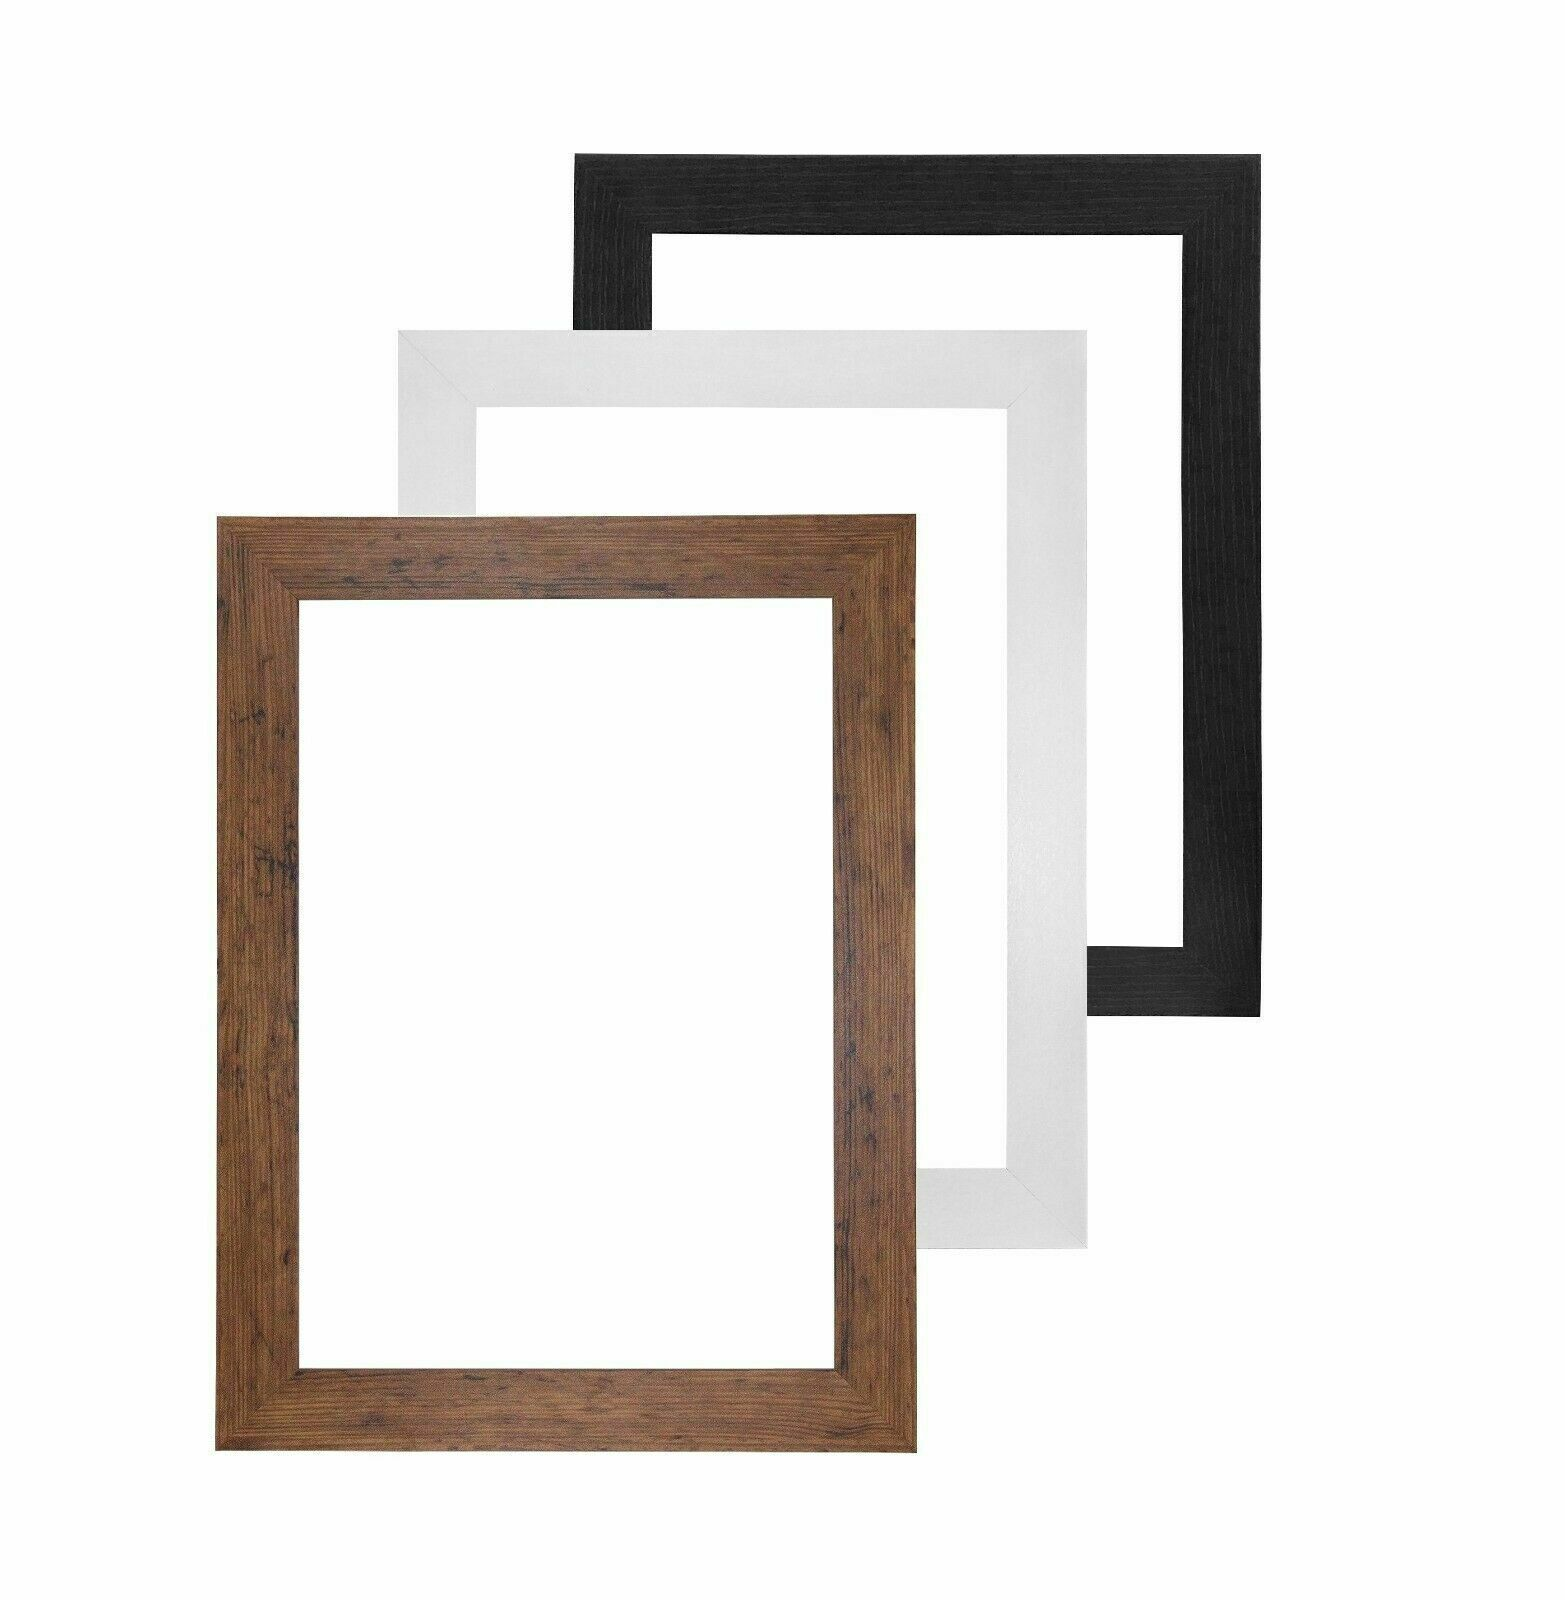 A1 A2 A3 A4 Picture Frames Photo Frames Art Poster Frames Black Walnut Oak White